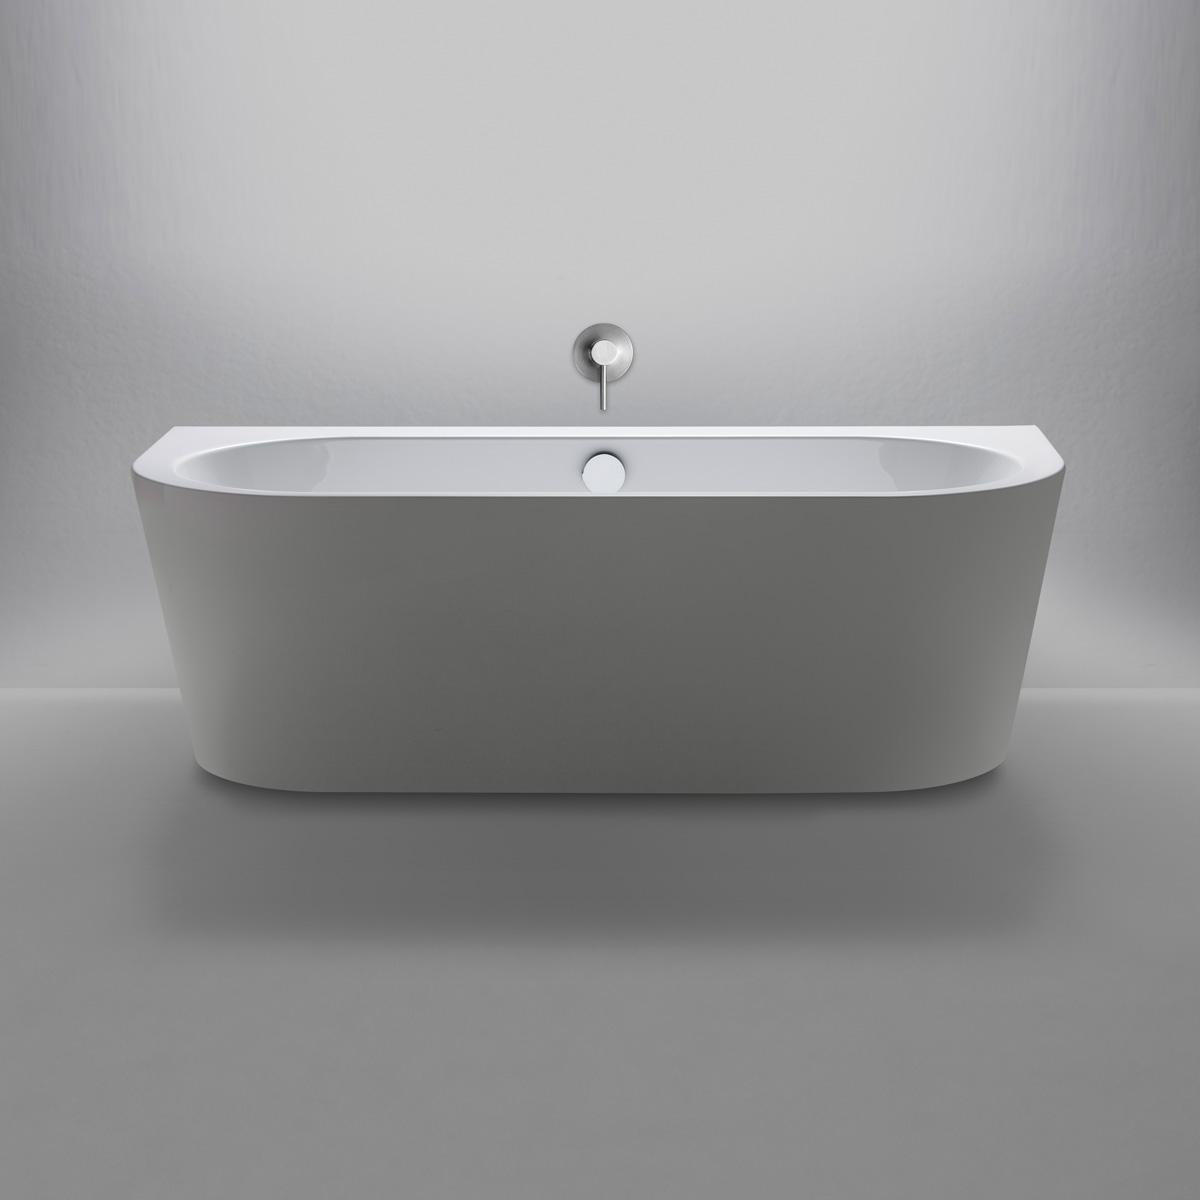 repabad livorno 180 80 oval f wand freistehende badewanne. Black Bedroom Furniture Sets. Home Design Ideas